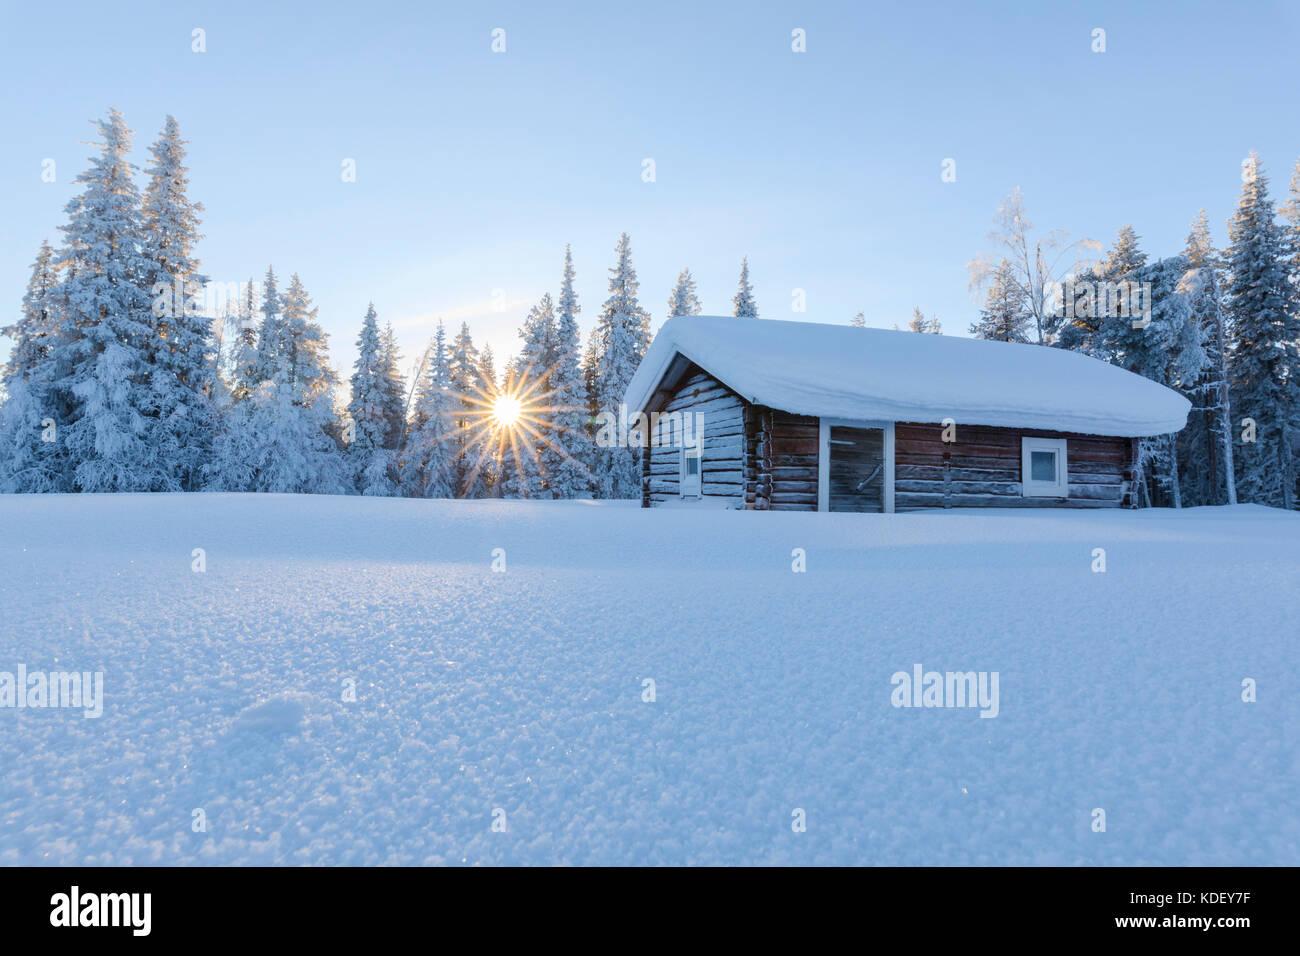 Sunburst on wooden hut covered with snow, Kiruna, Norrbotten County, Lapland, Sweden Stock Photo